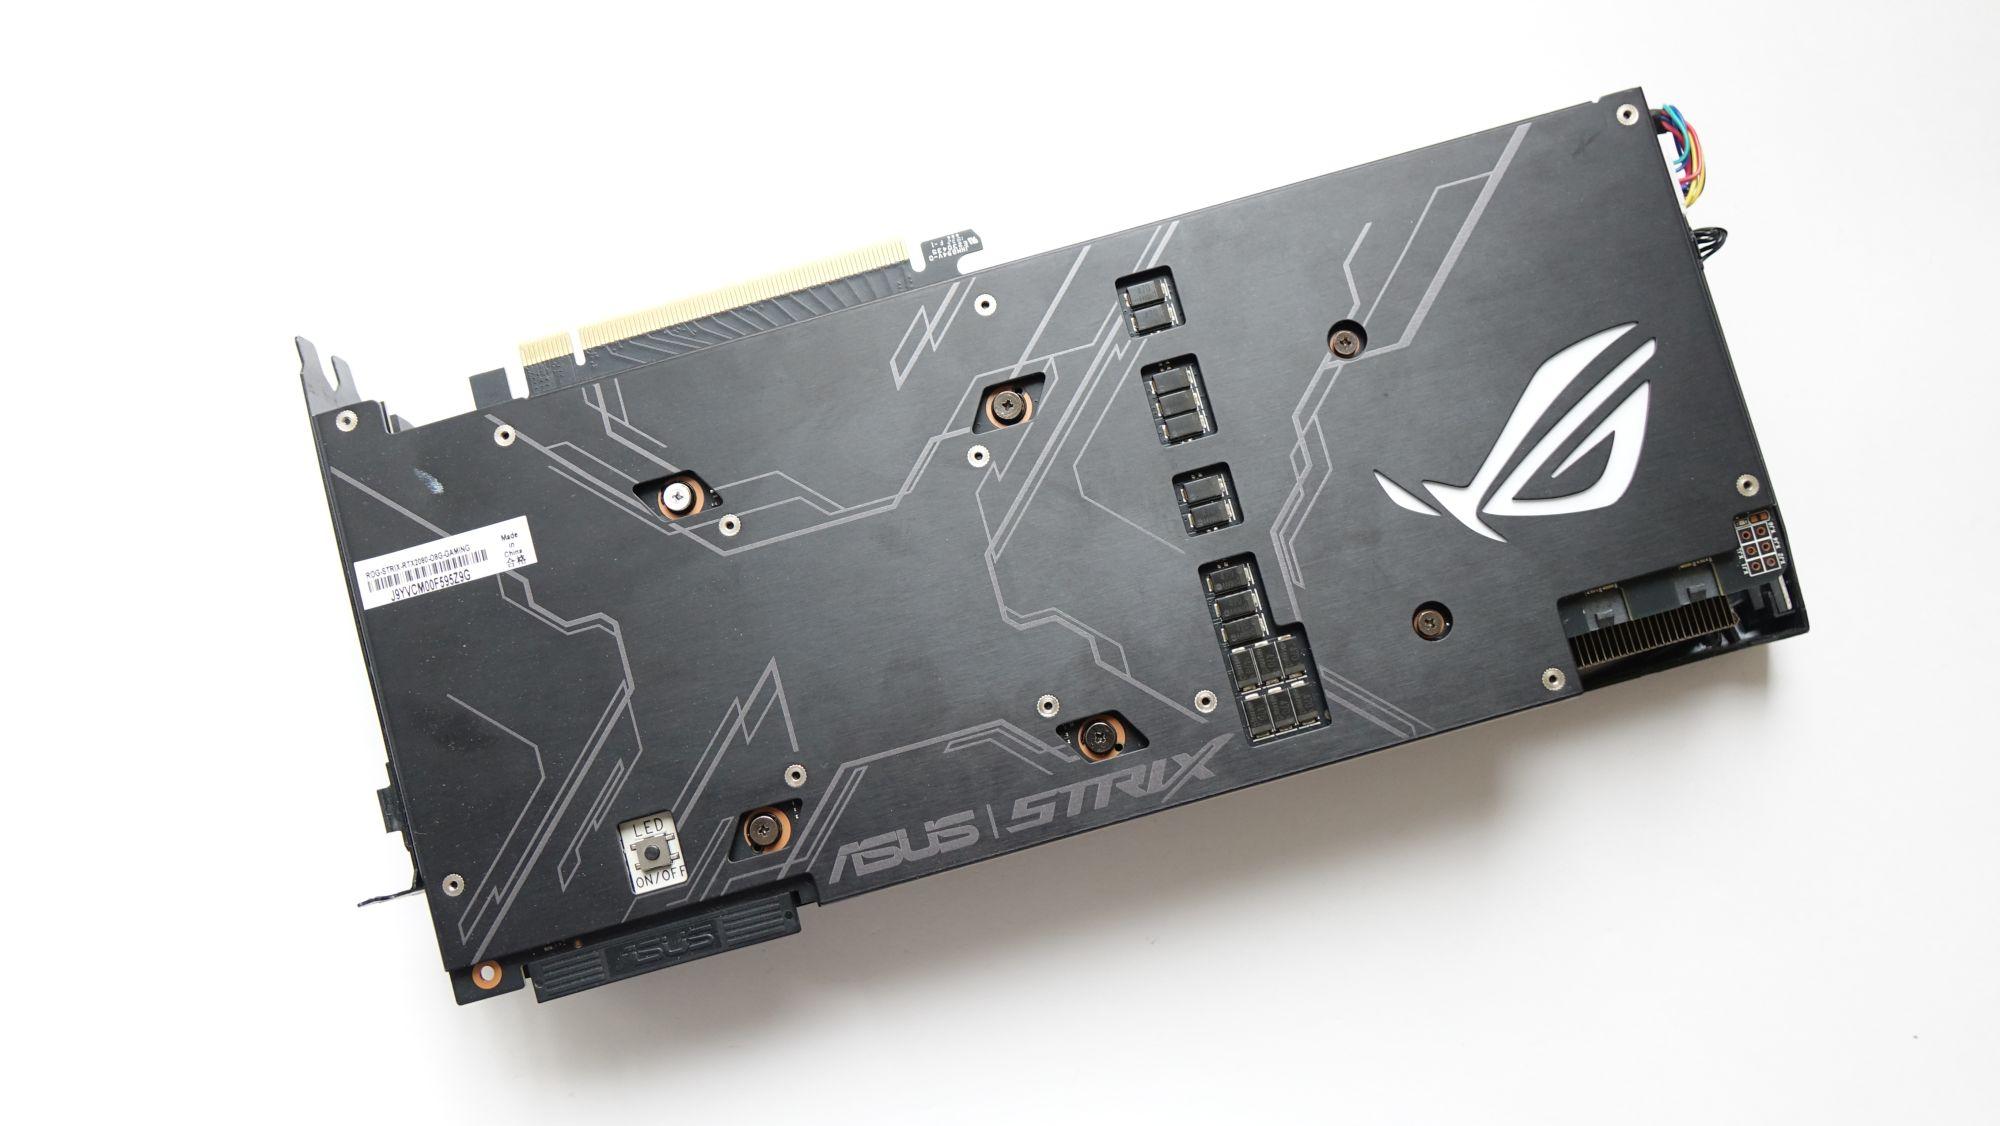 ASUS ROG Strix GeForce RTX 2080 бэкплейт